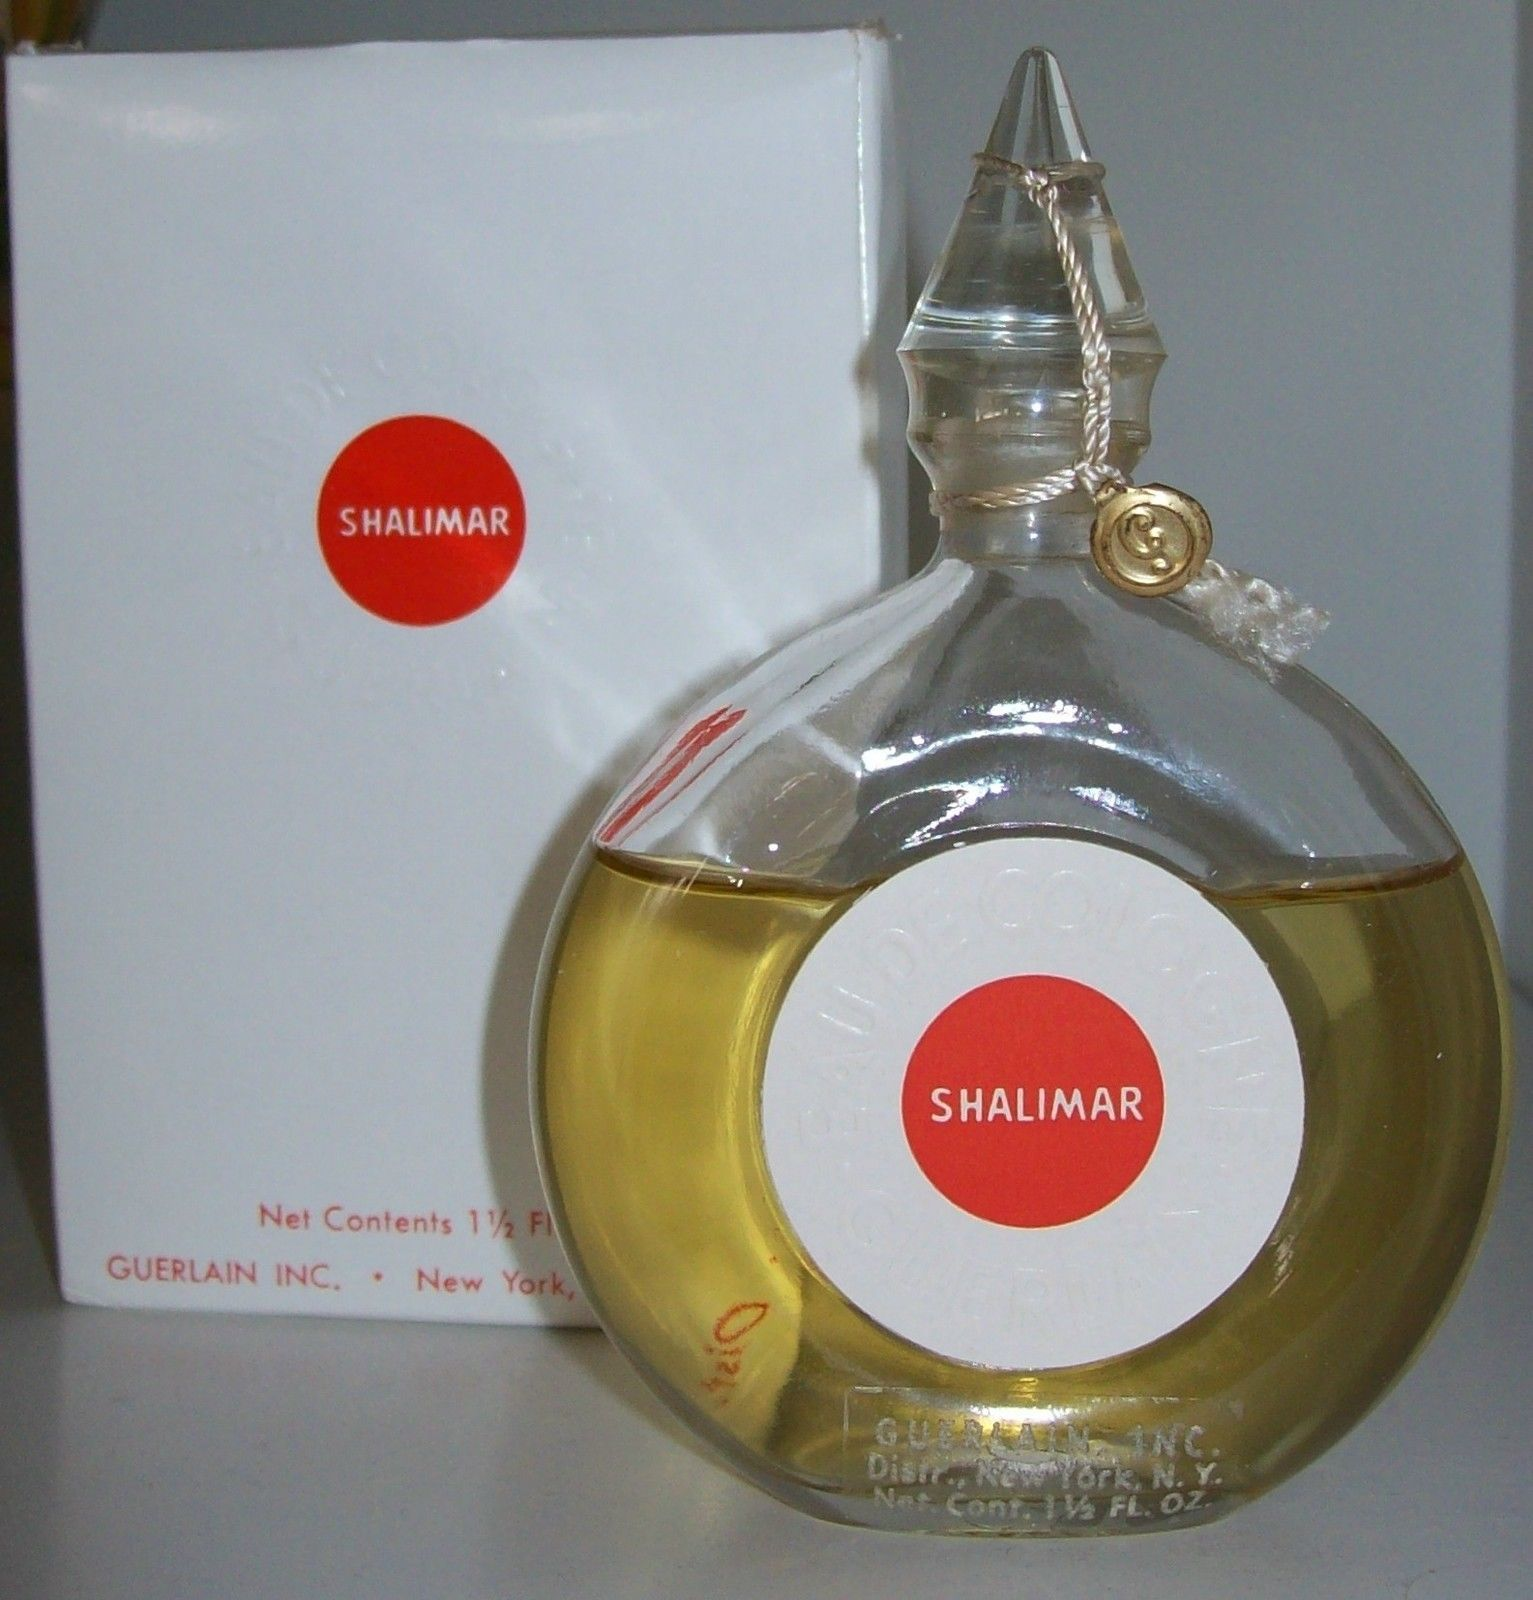 Vintage Guerlain Shalimar Eau De Cologne15 And 50 Similar Items Parfum 90ml Fl Ozsealed Bottle With Boxfrance